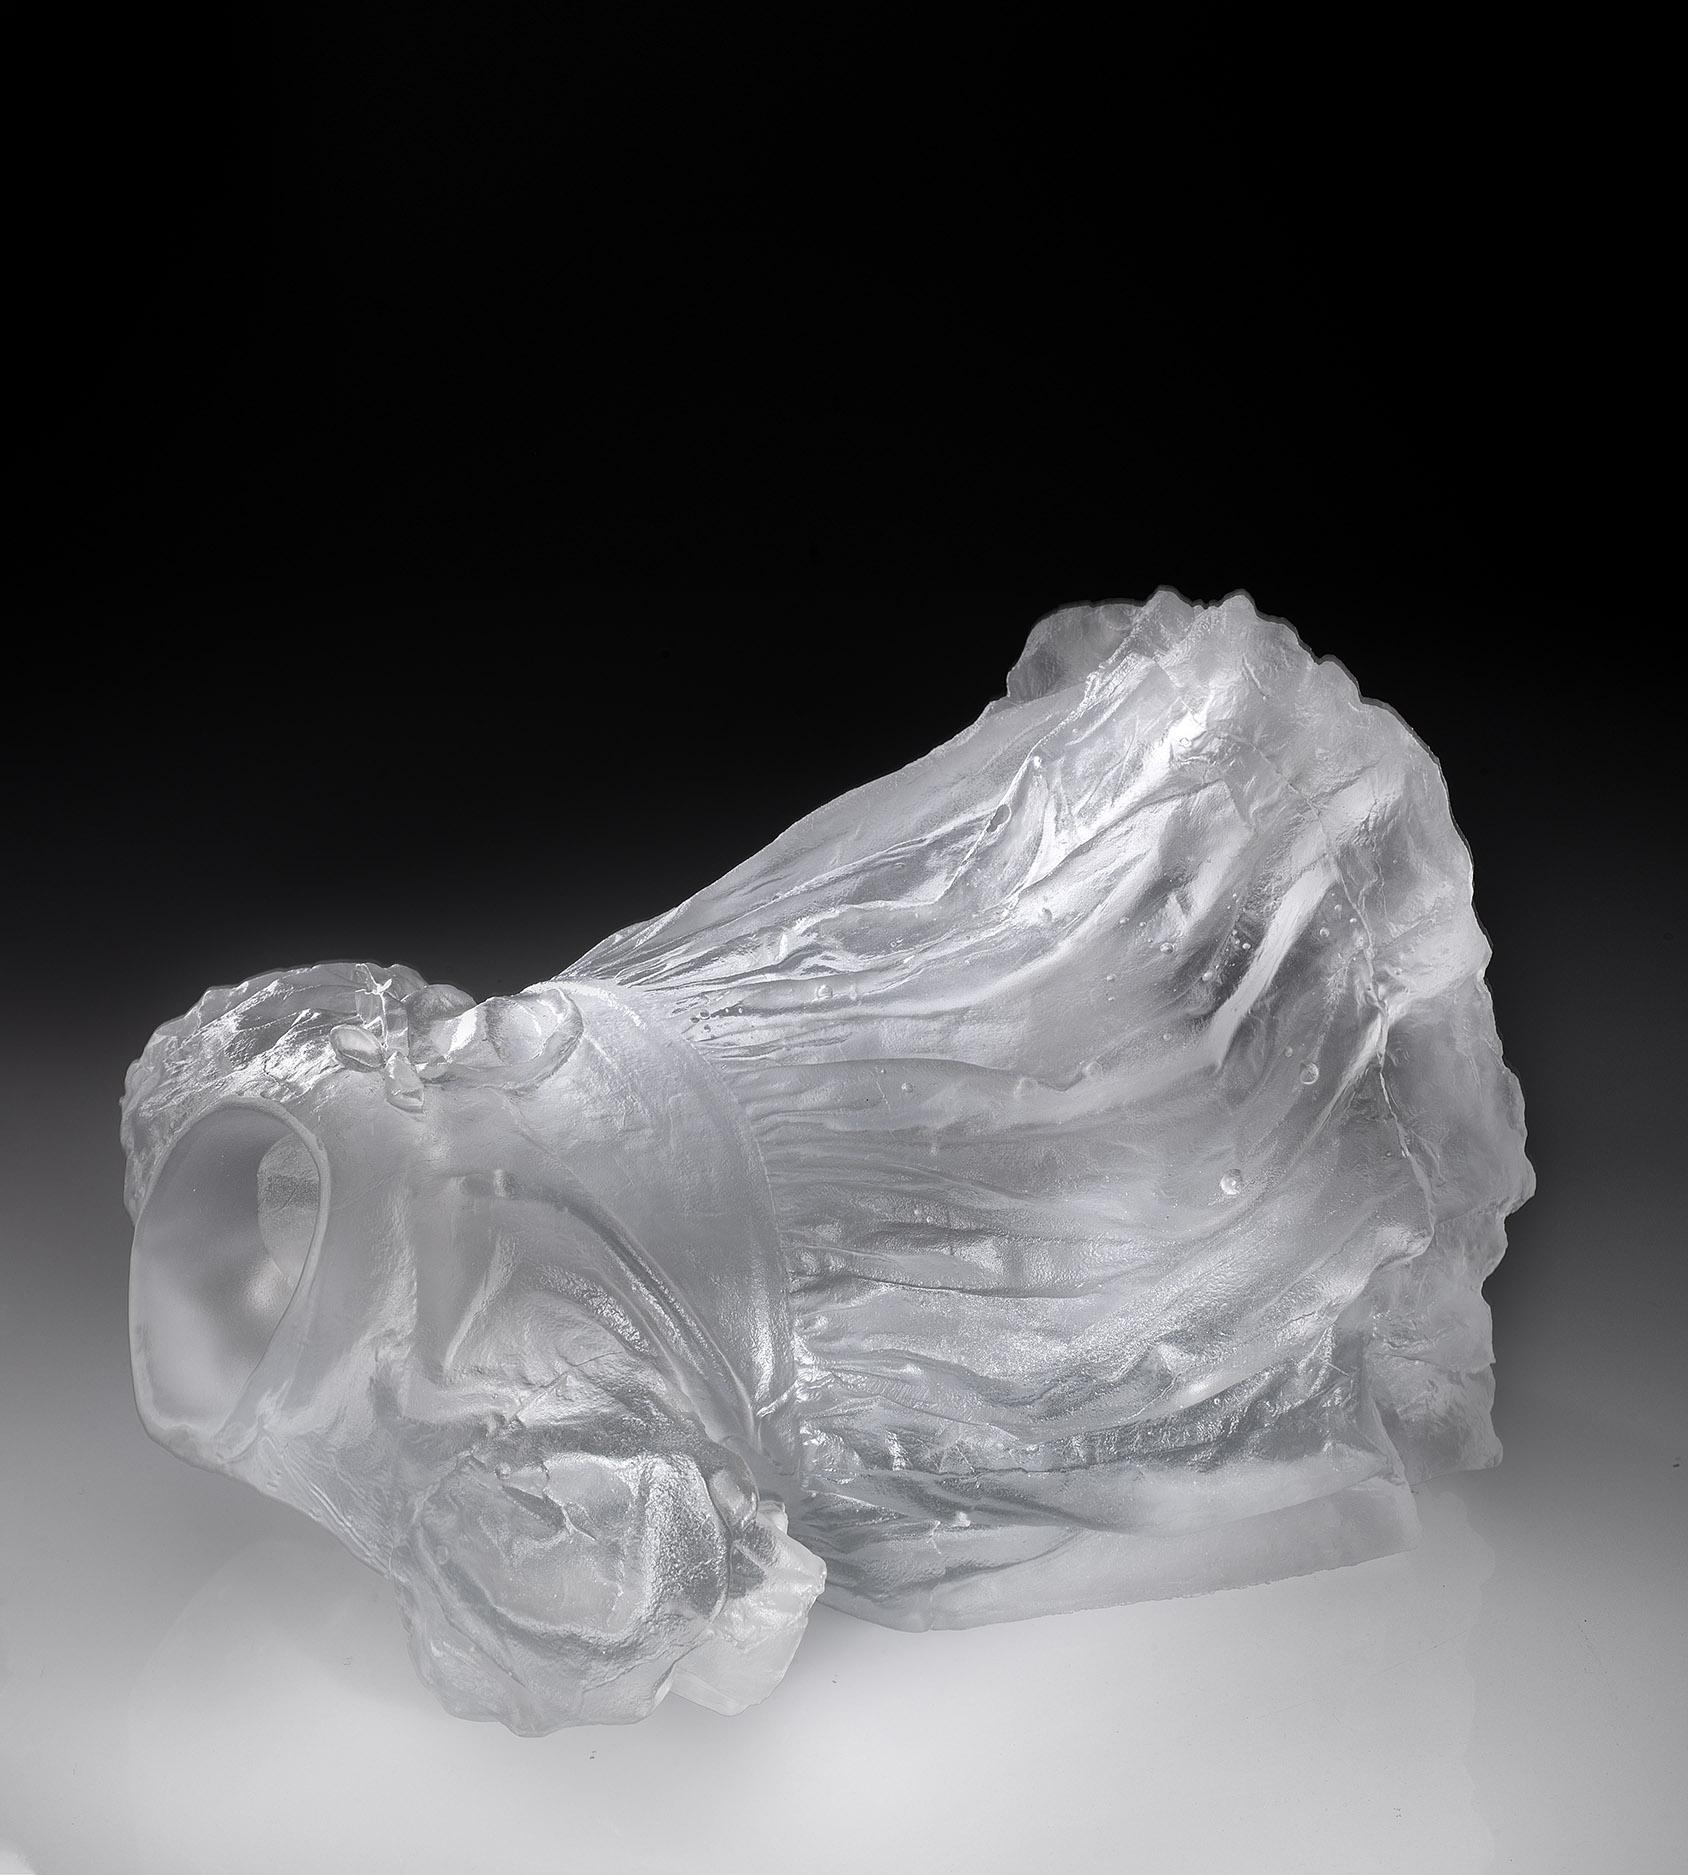 16th MasterWorks Auction - Habatat Galleries